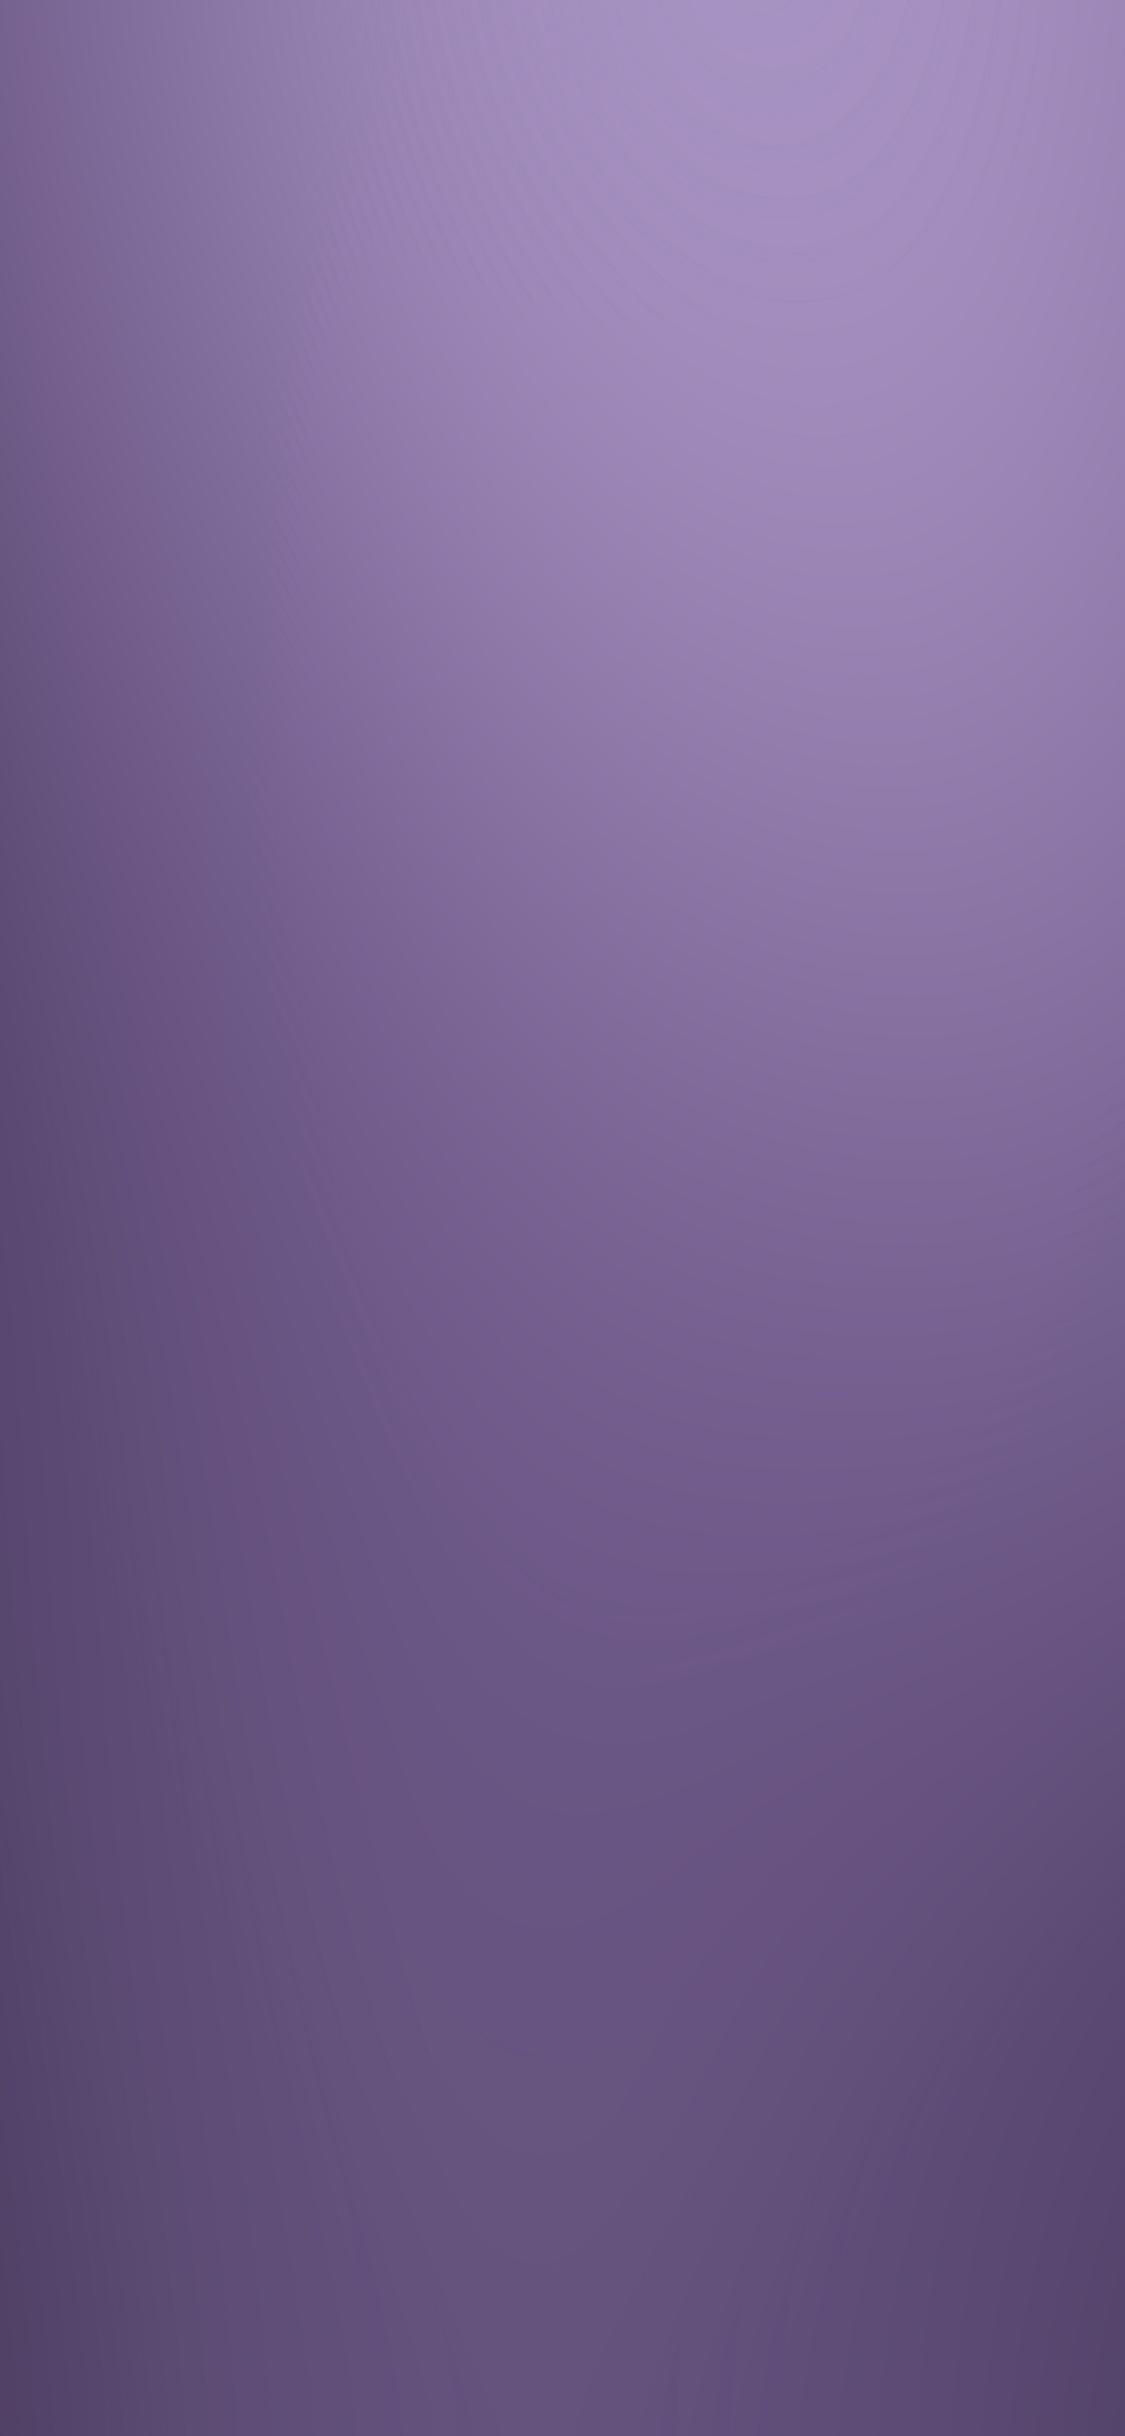 iPhoneXpapers.com-Apple-iPhone-wallpaper-sf89-purple-blue-solid-gradation-blur